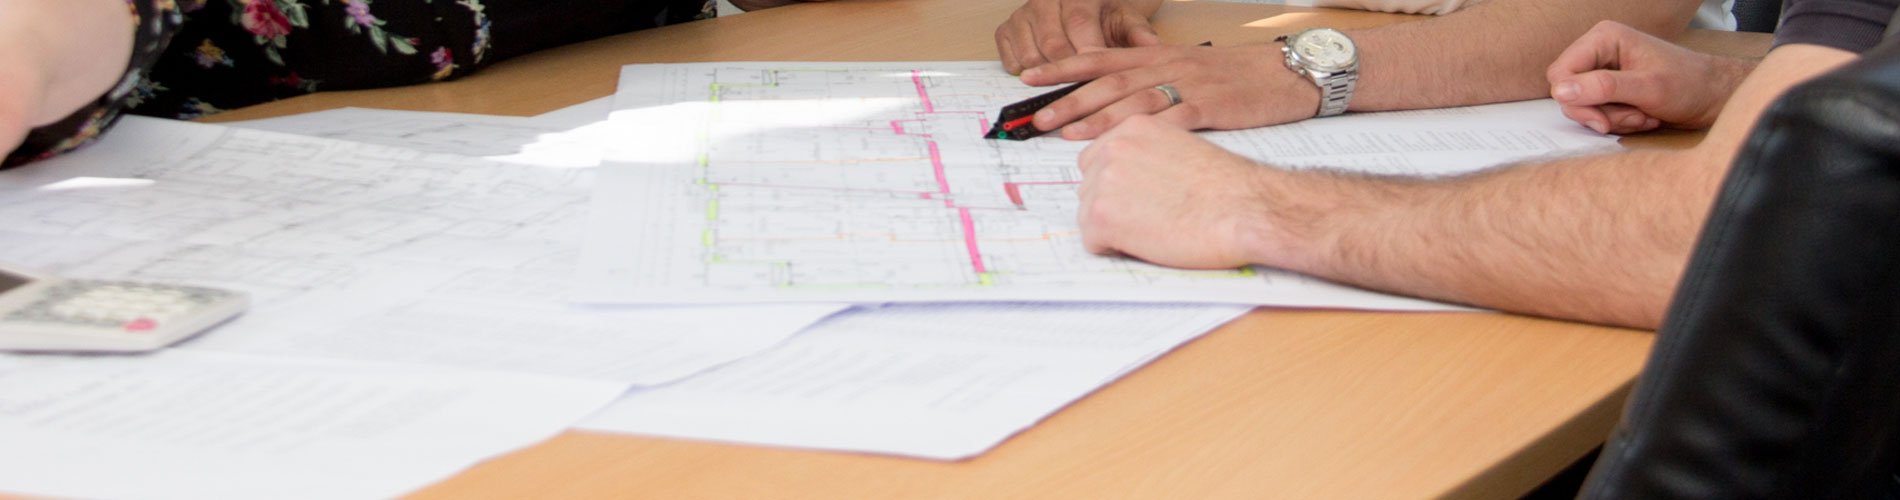 Planning Energy Statements